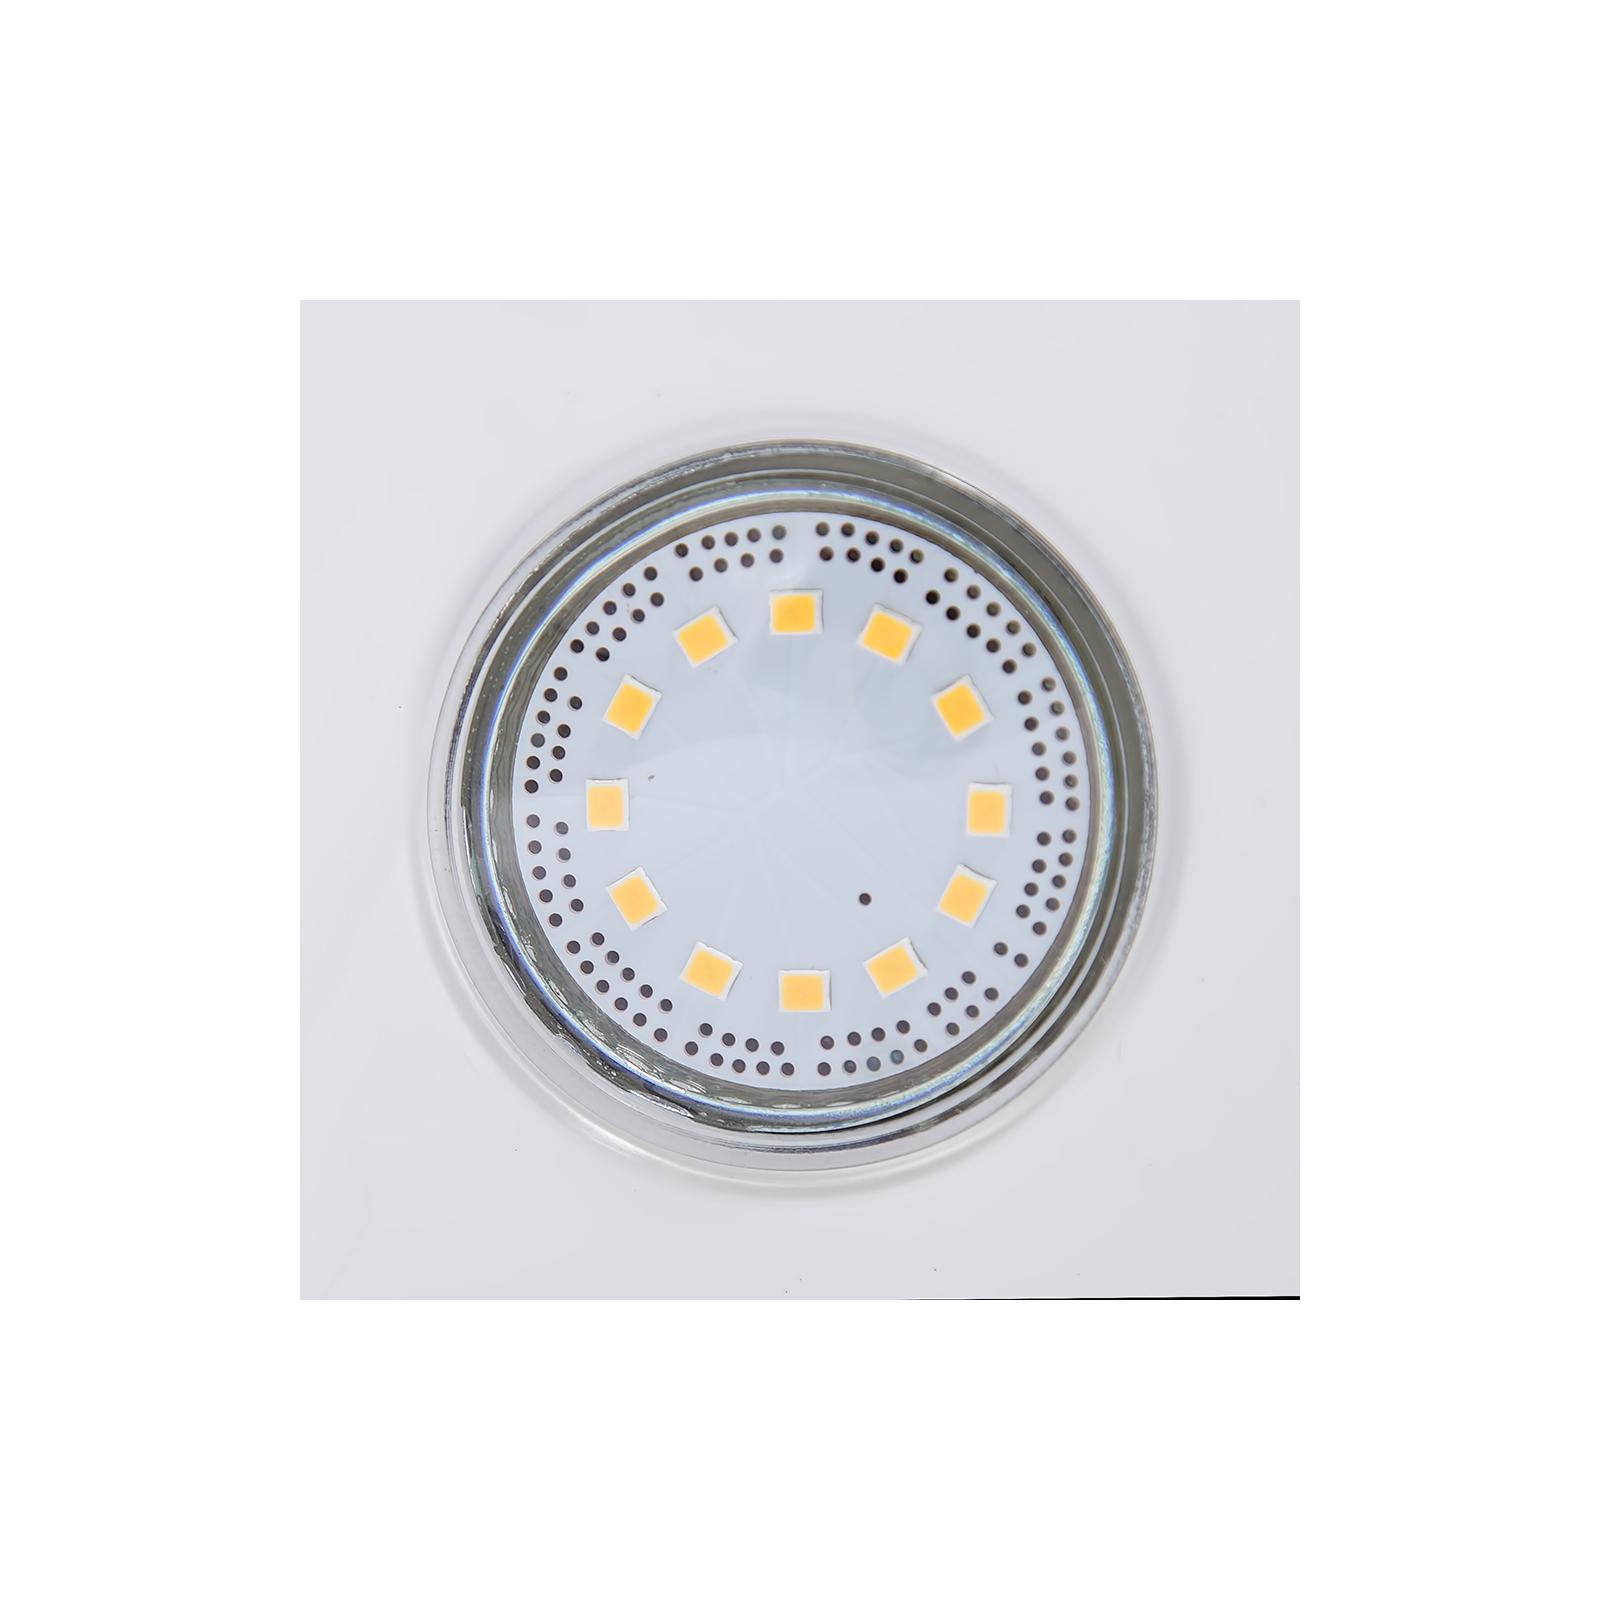 Вытяжка кухонная PERFELLI TL 6612 W LED изображение 7